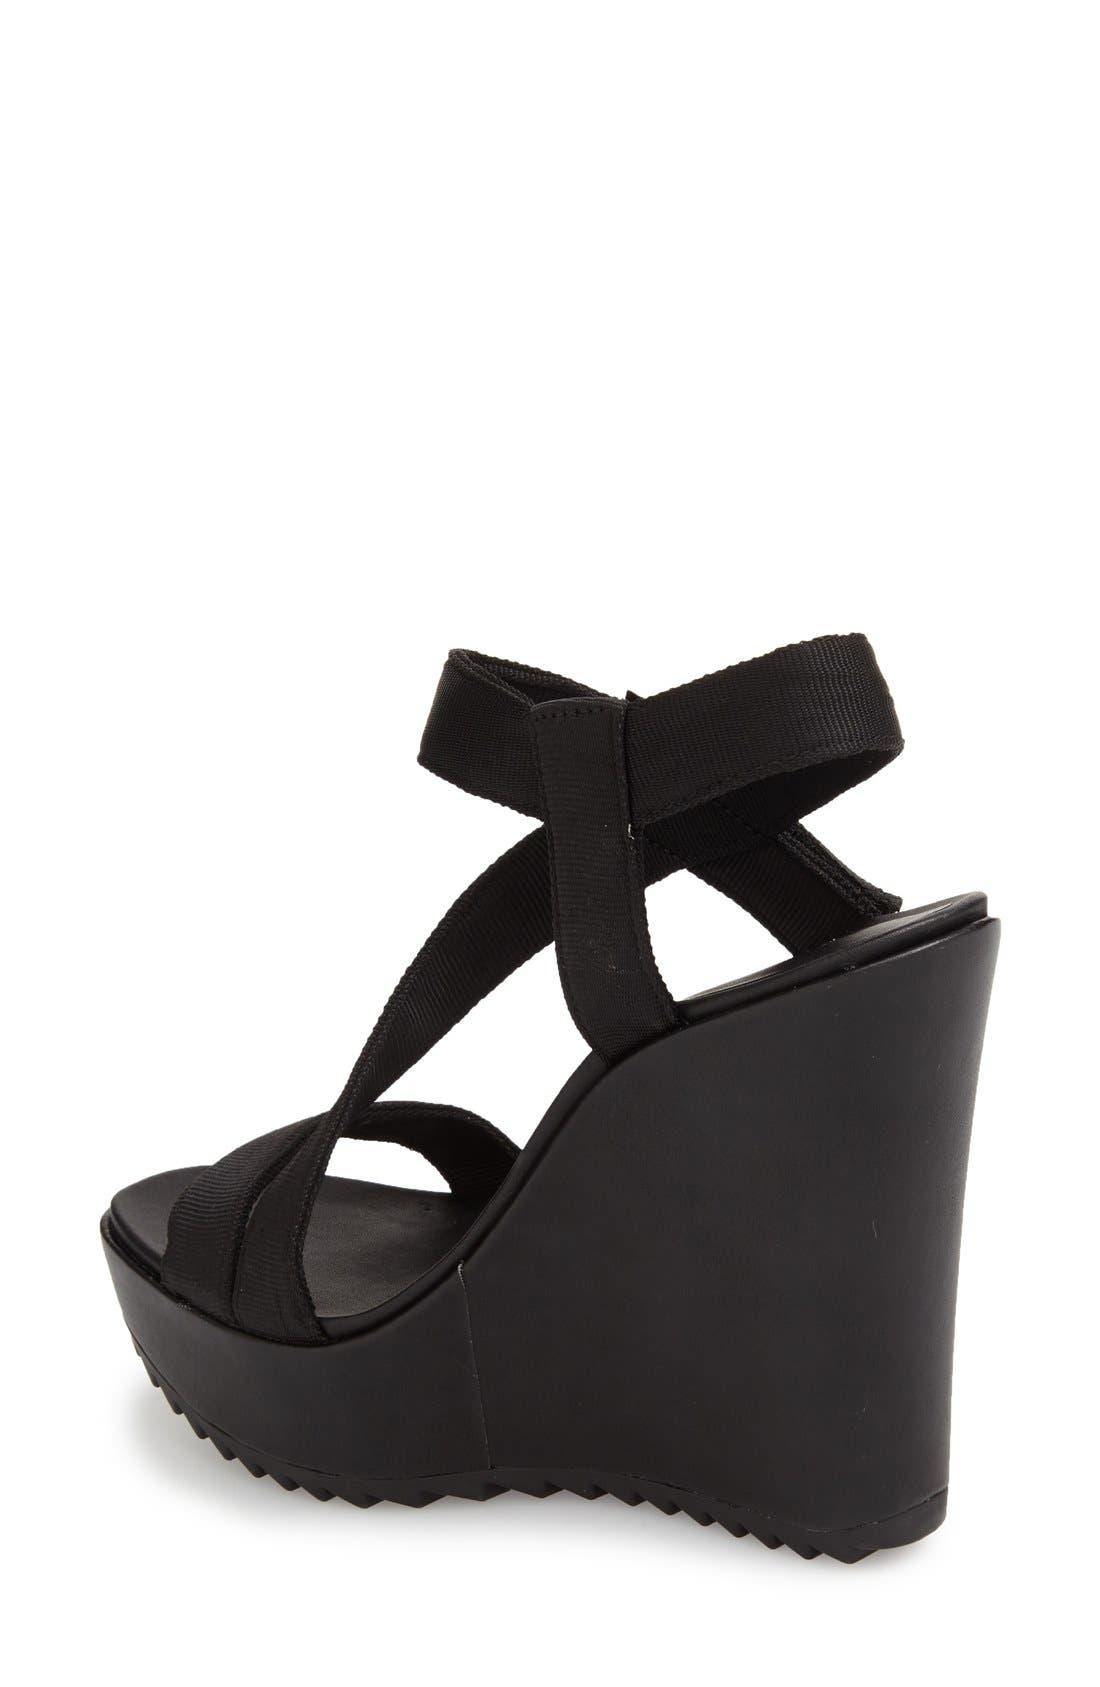 Alternate Image 2  - BCBGeneration 'Carille' Wedge Sandal (Women)